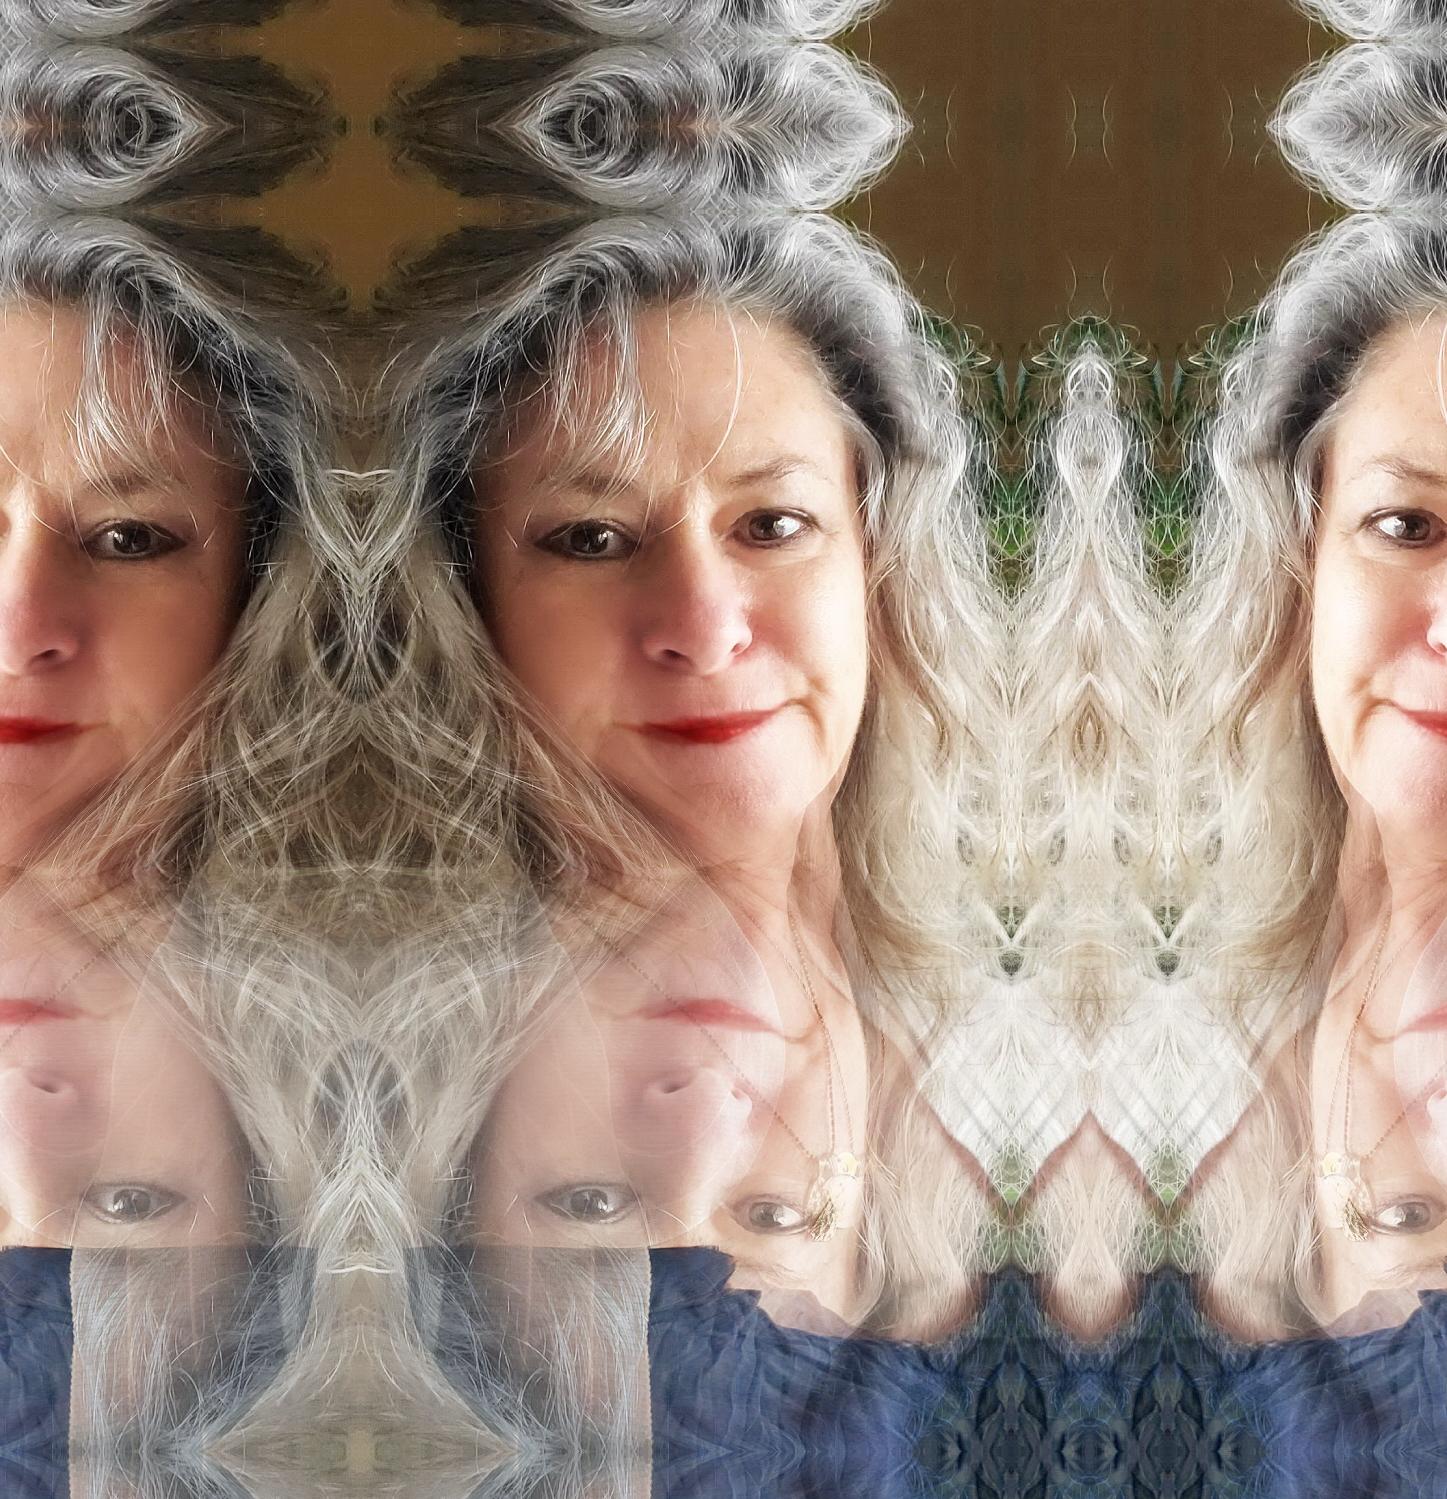 Author, Poet, Multigenre Creative